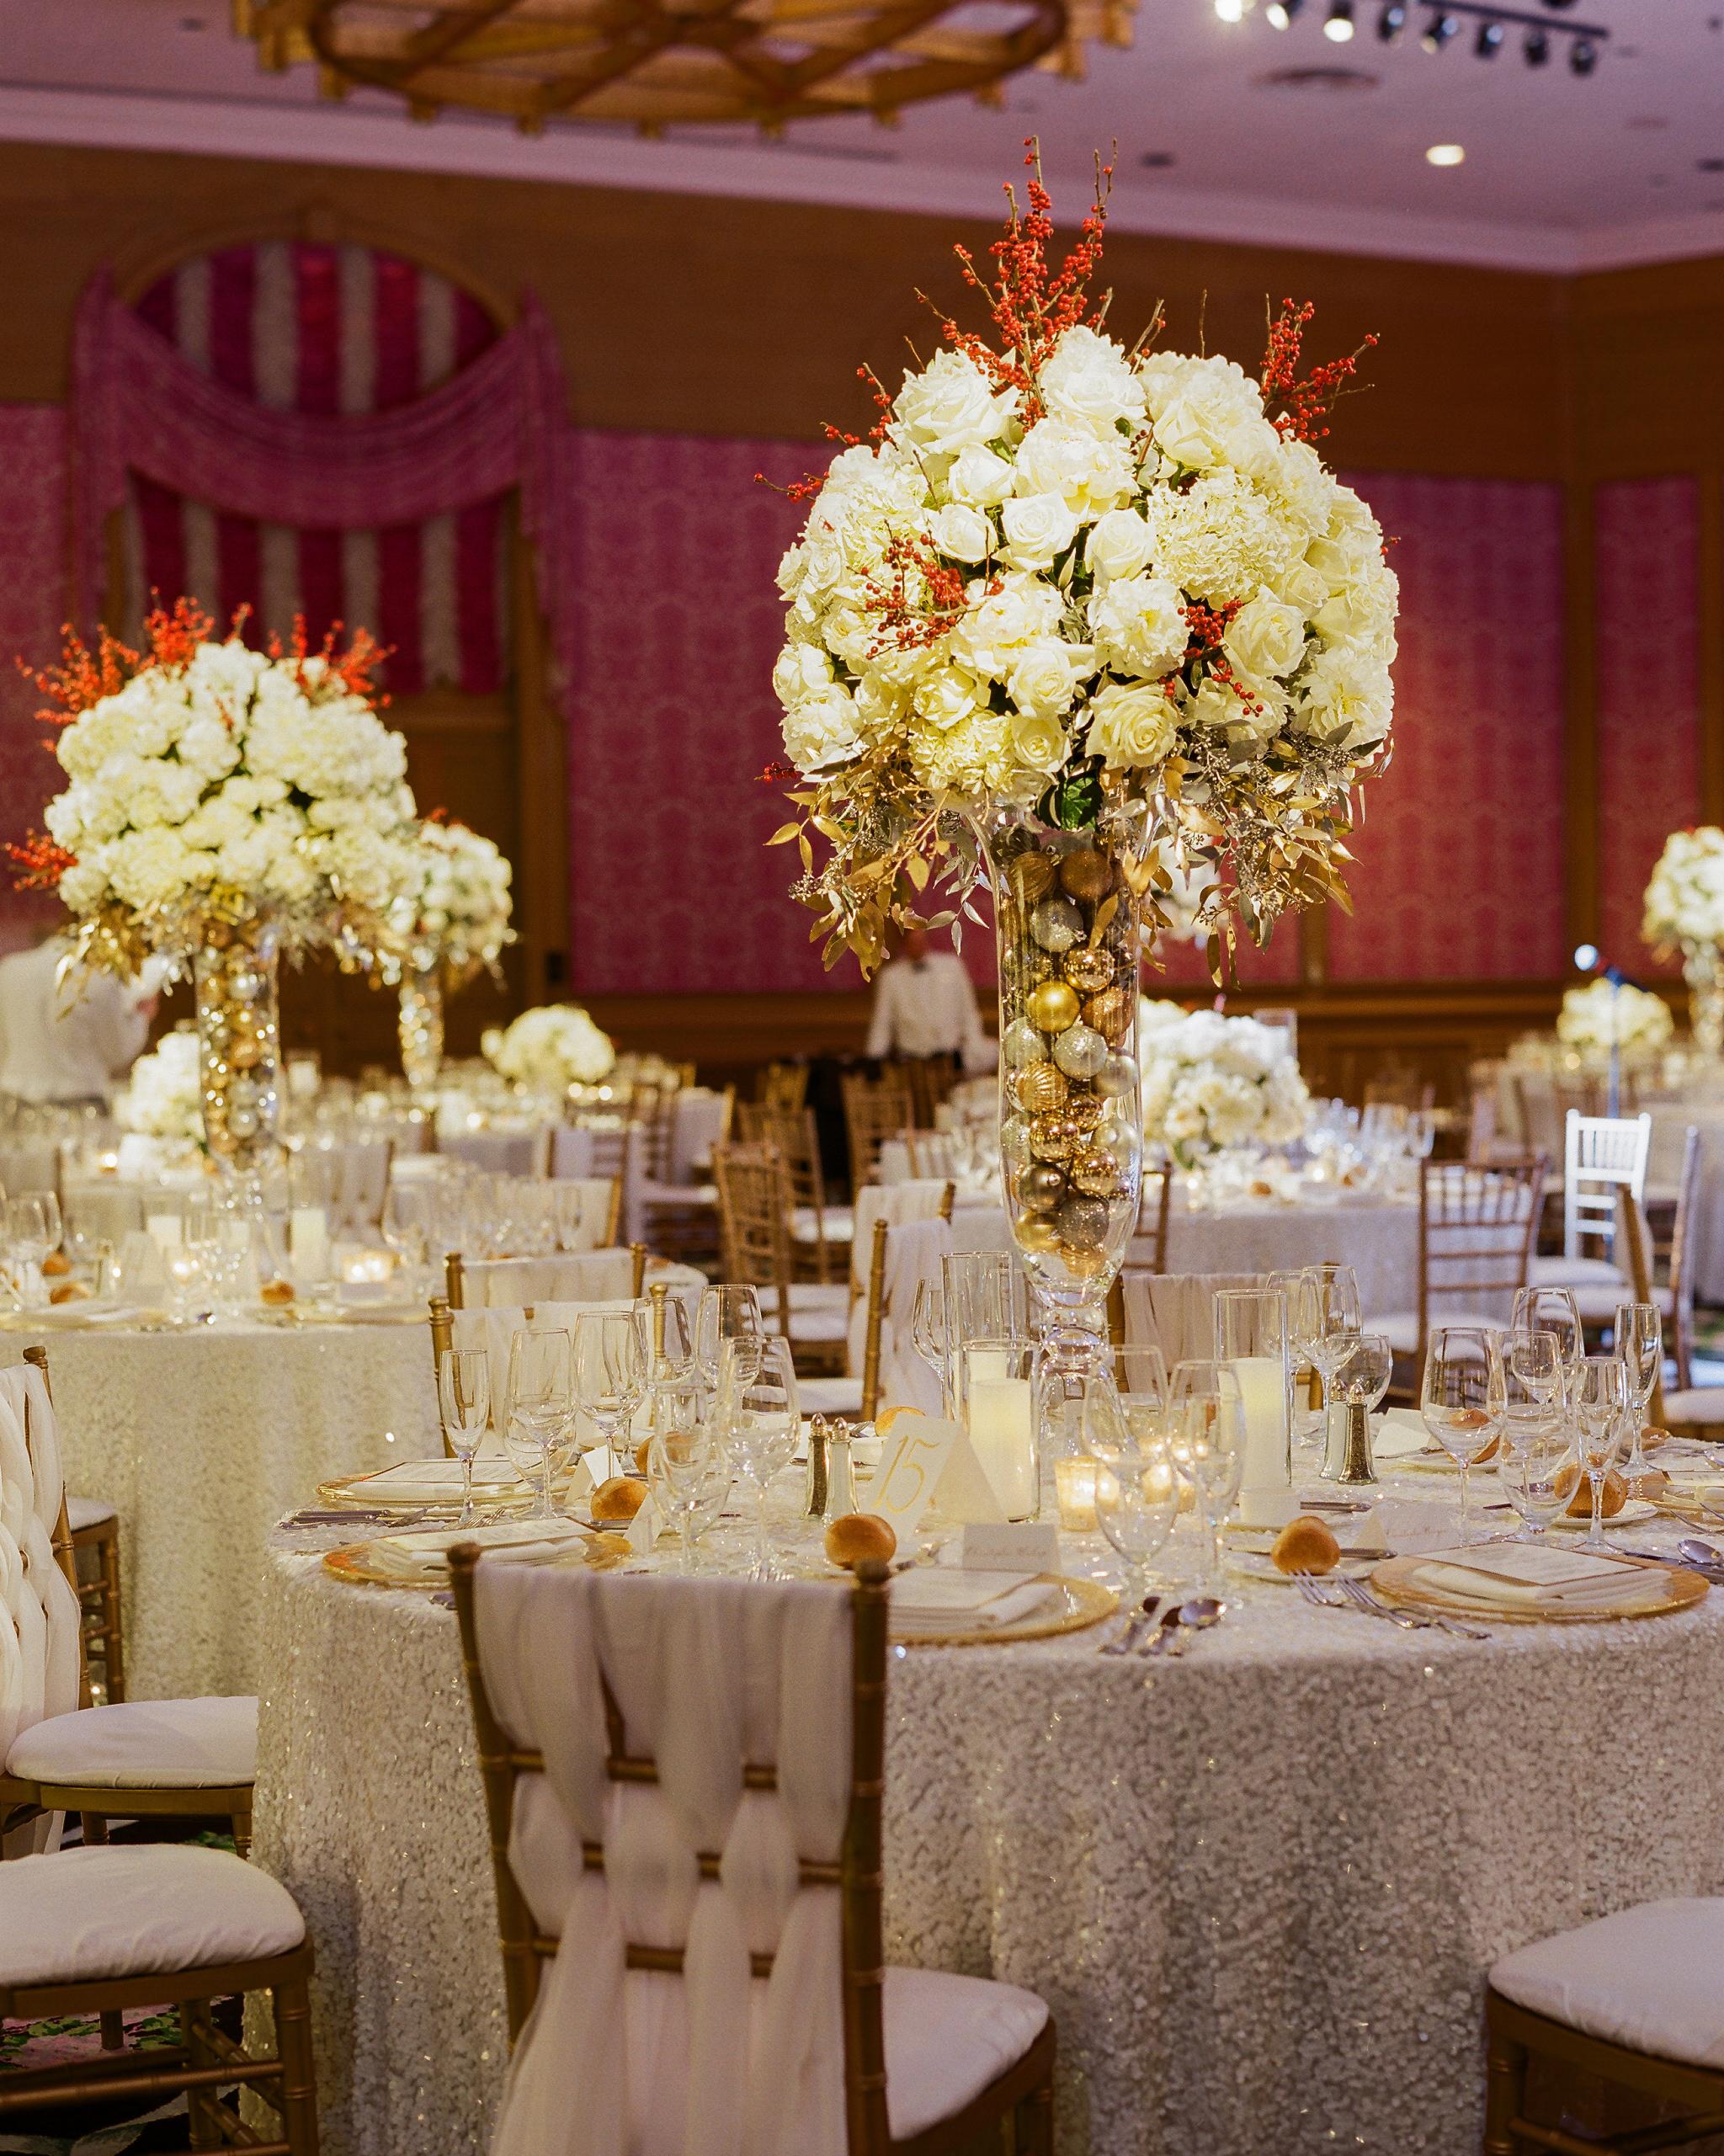 paige-michael-wedding-centerpiece-0952-s112431-1215.jpg